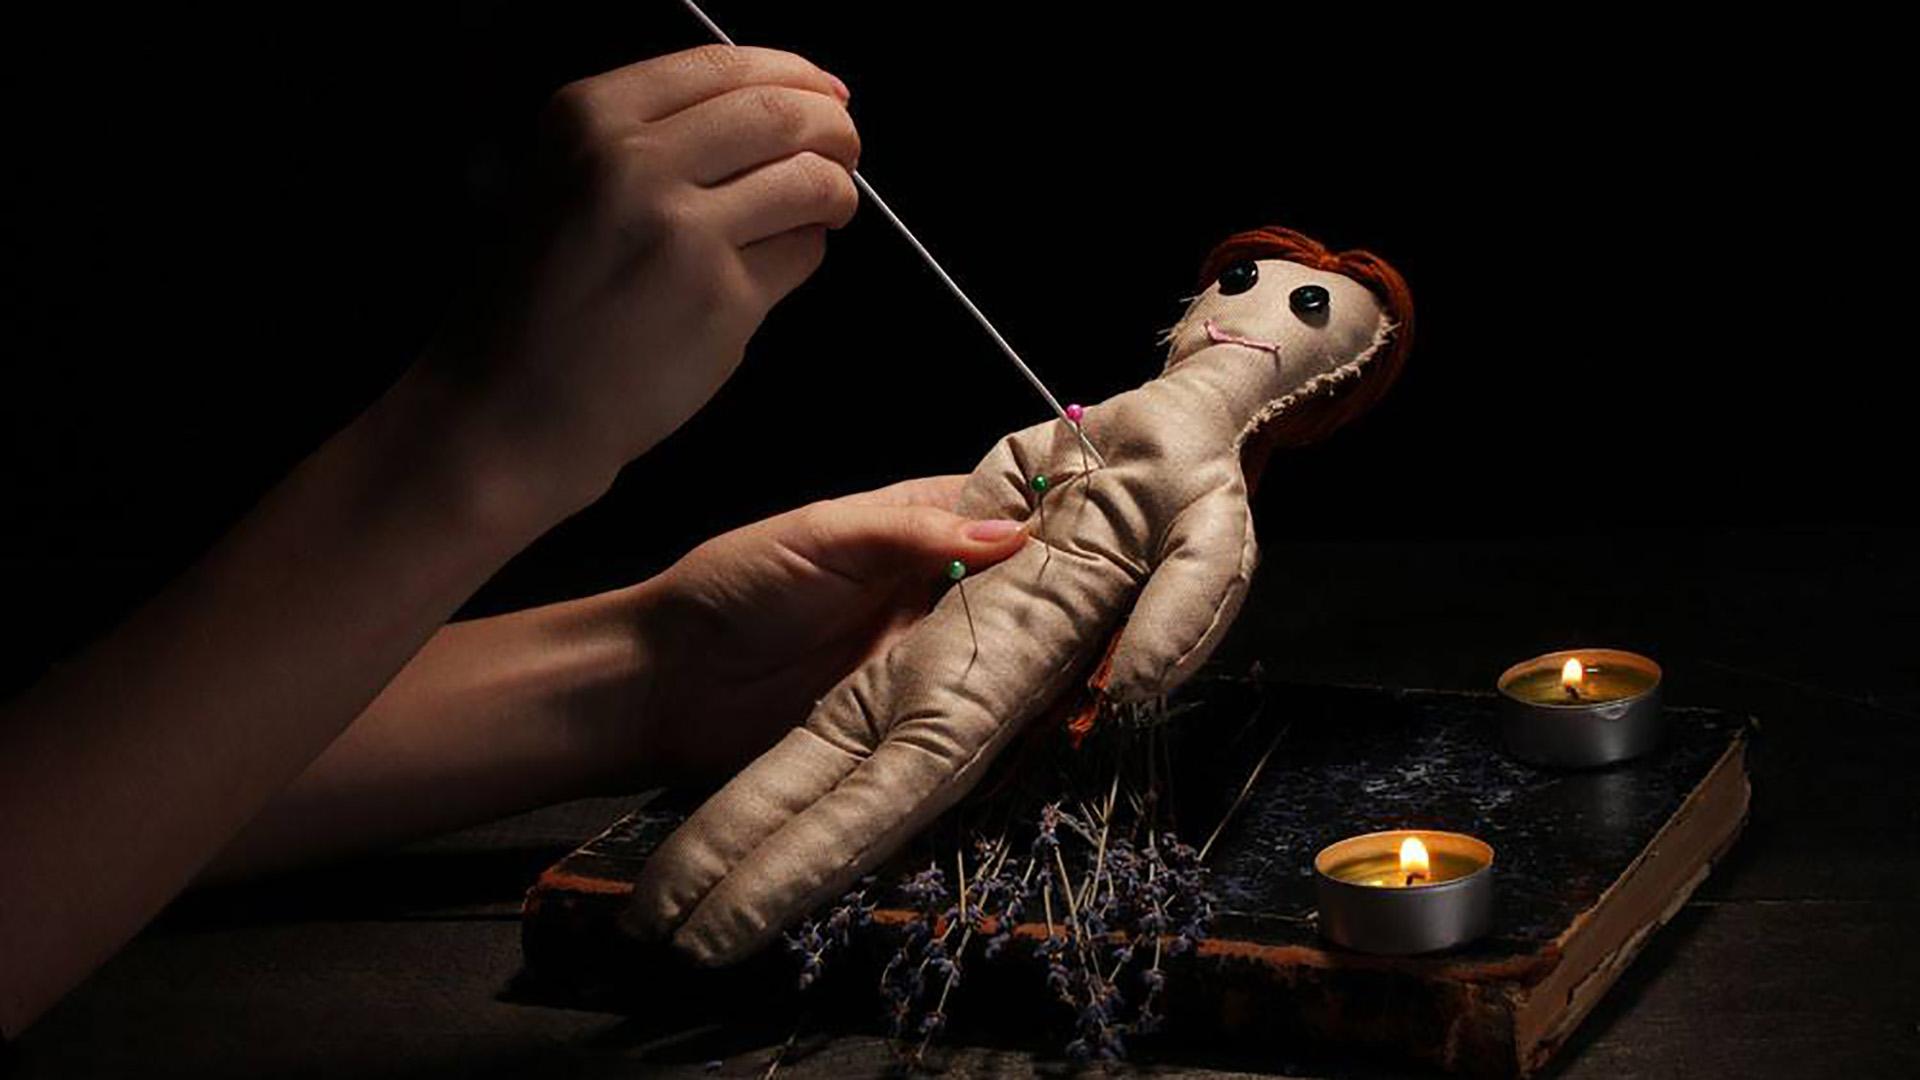 Bambole voodoo storia